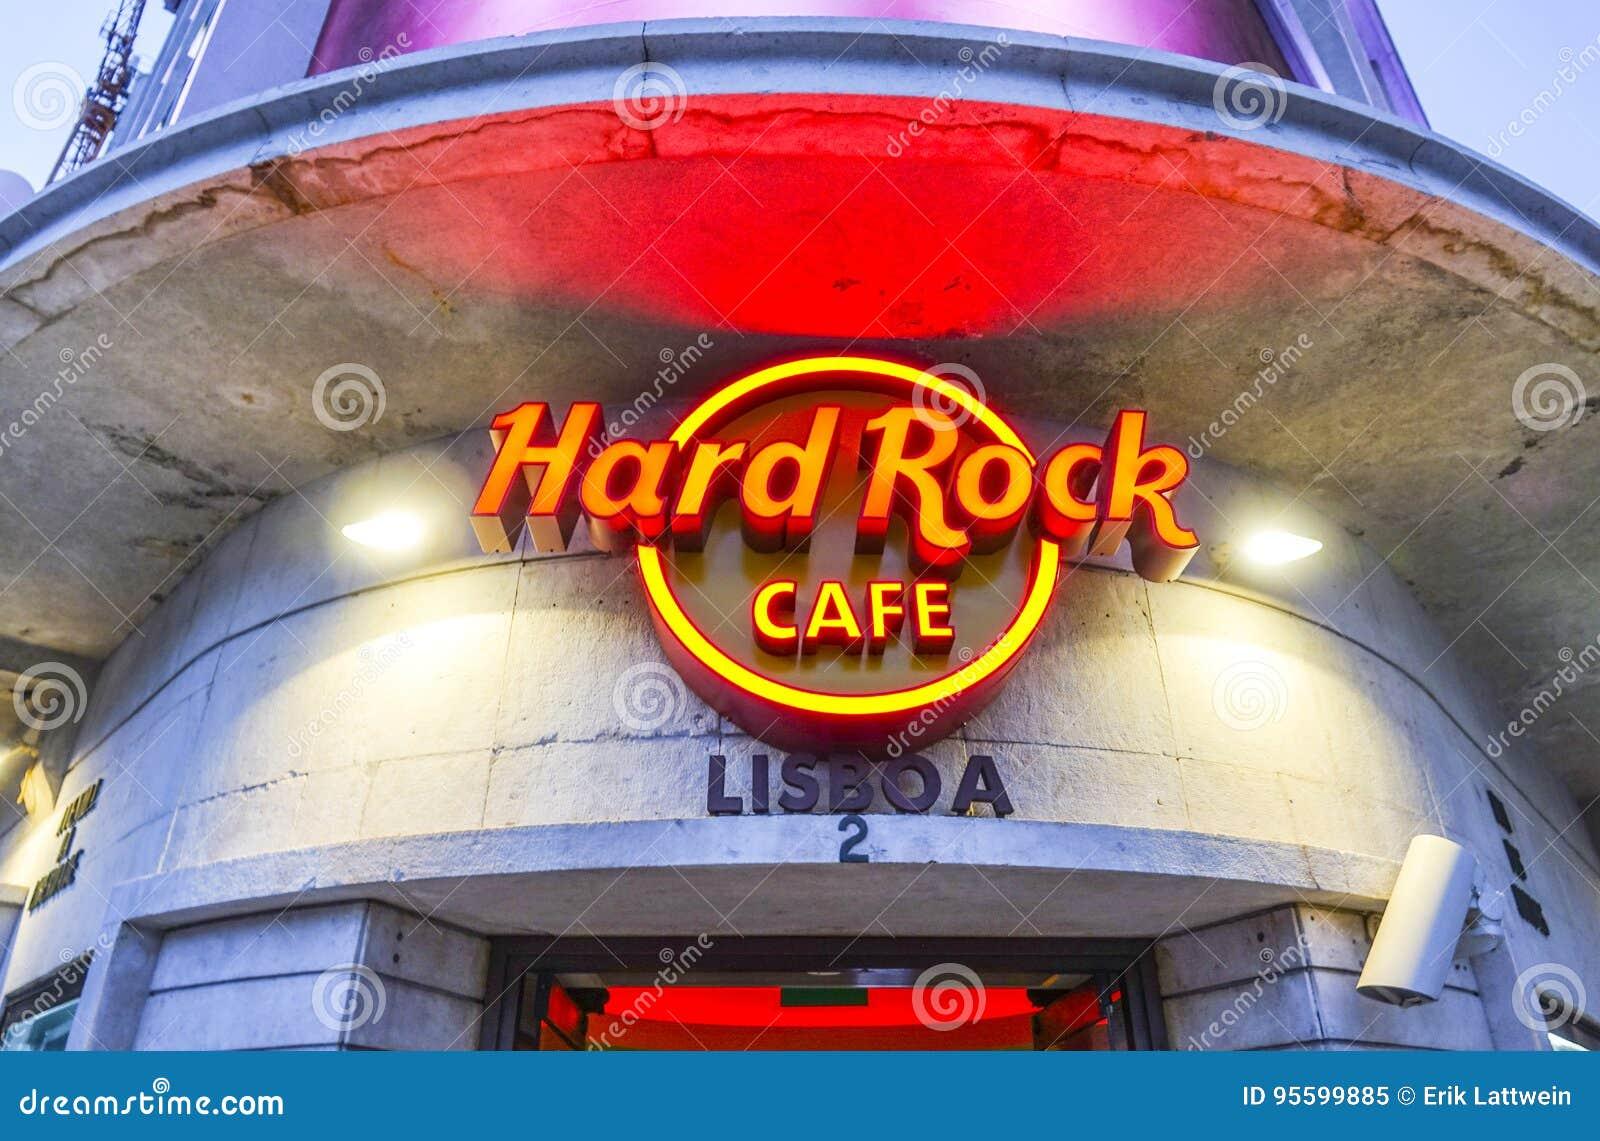 Hard Rock Cafe Lissabon Preise